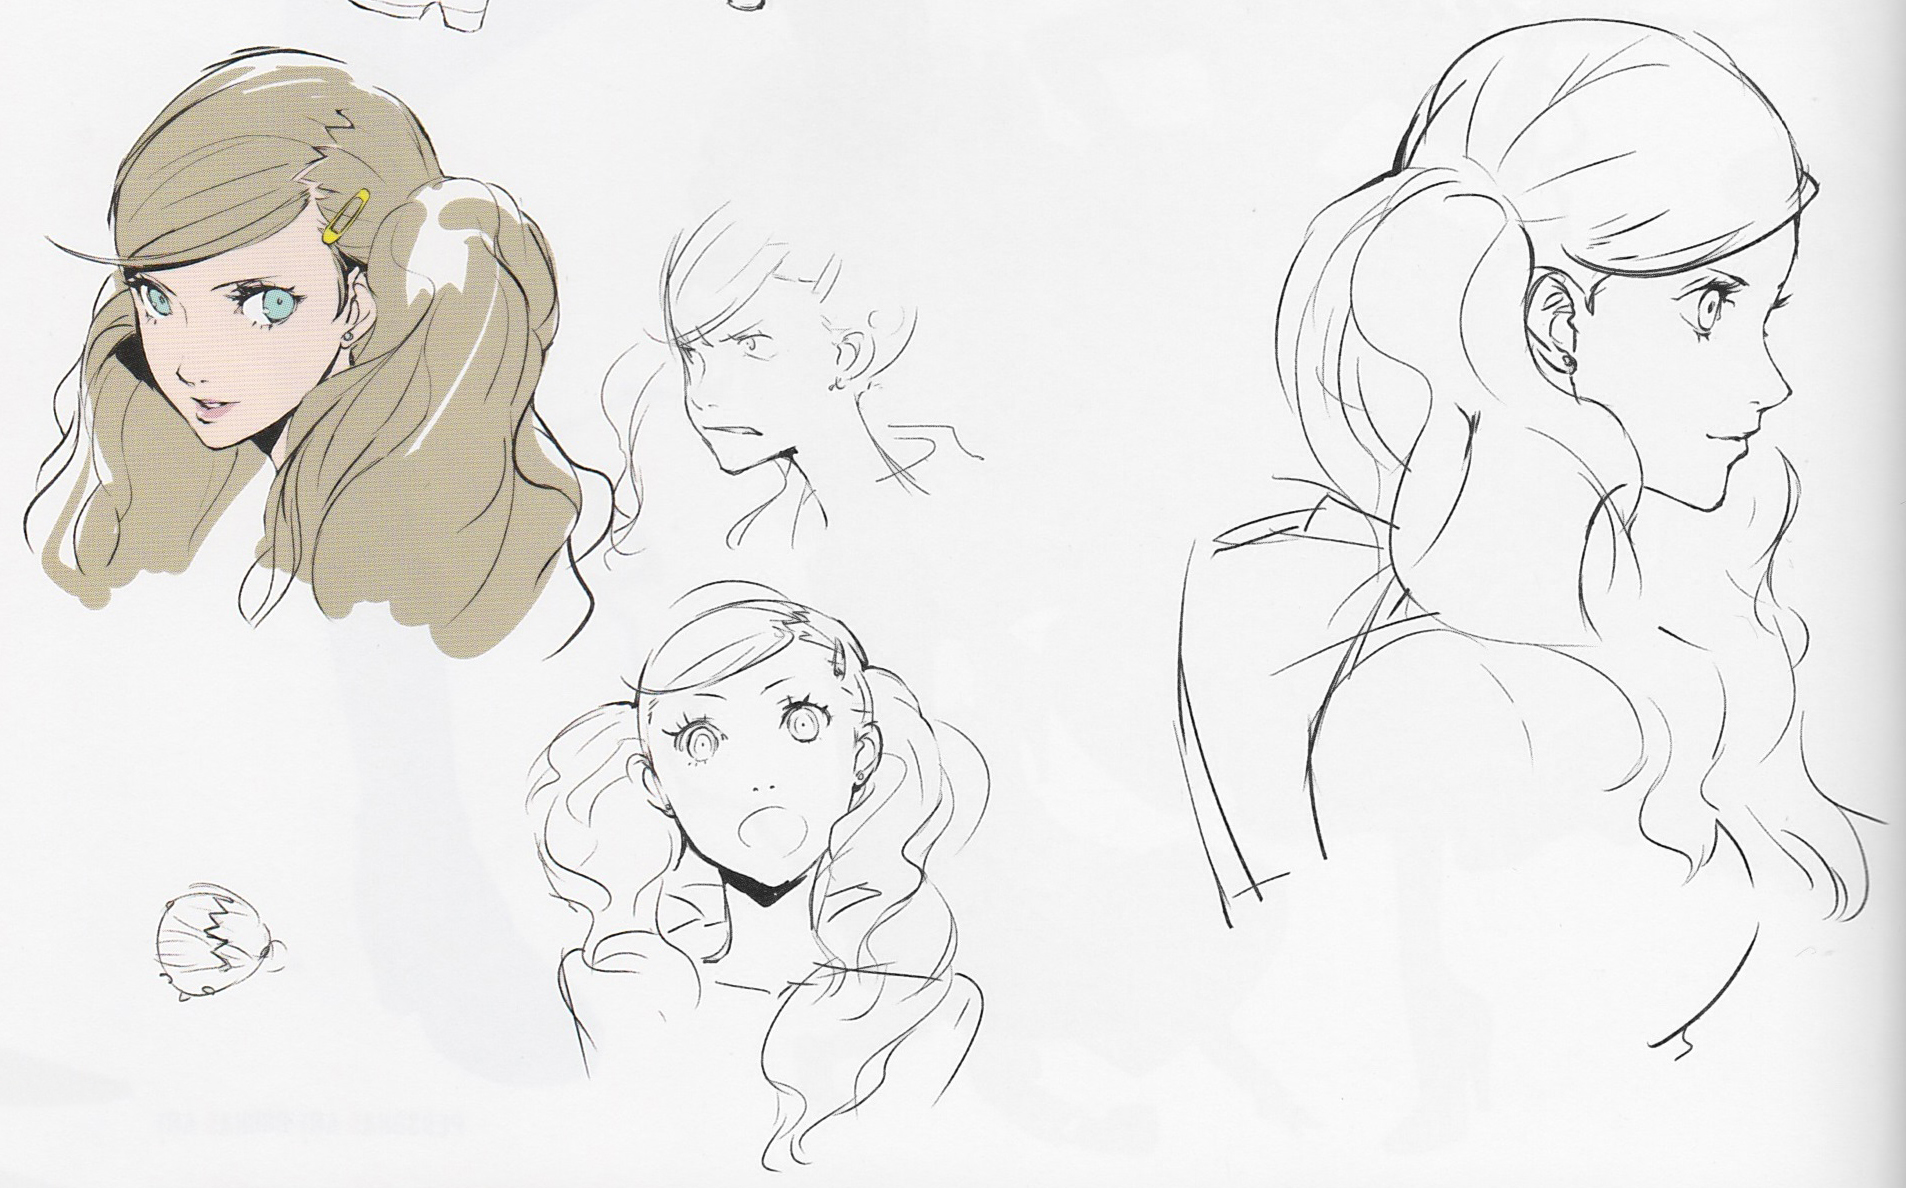 File:P5 close up artwork of Anne Takamaki.jpg